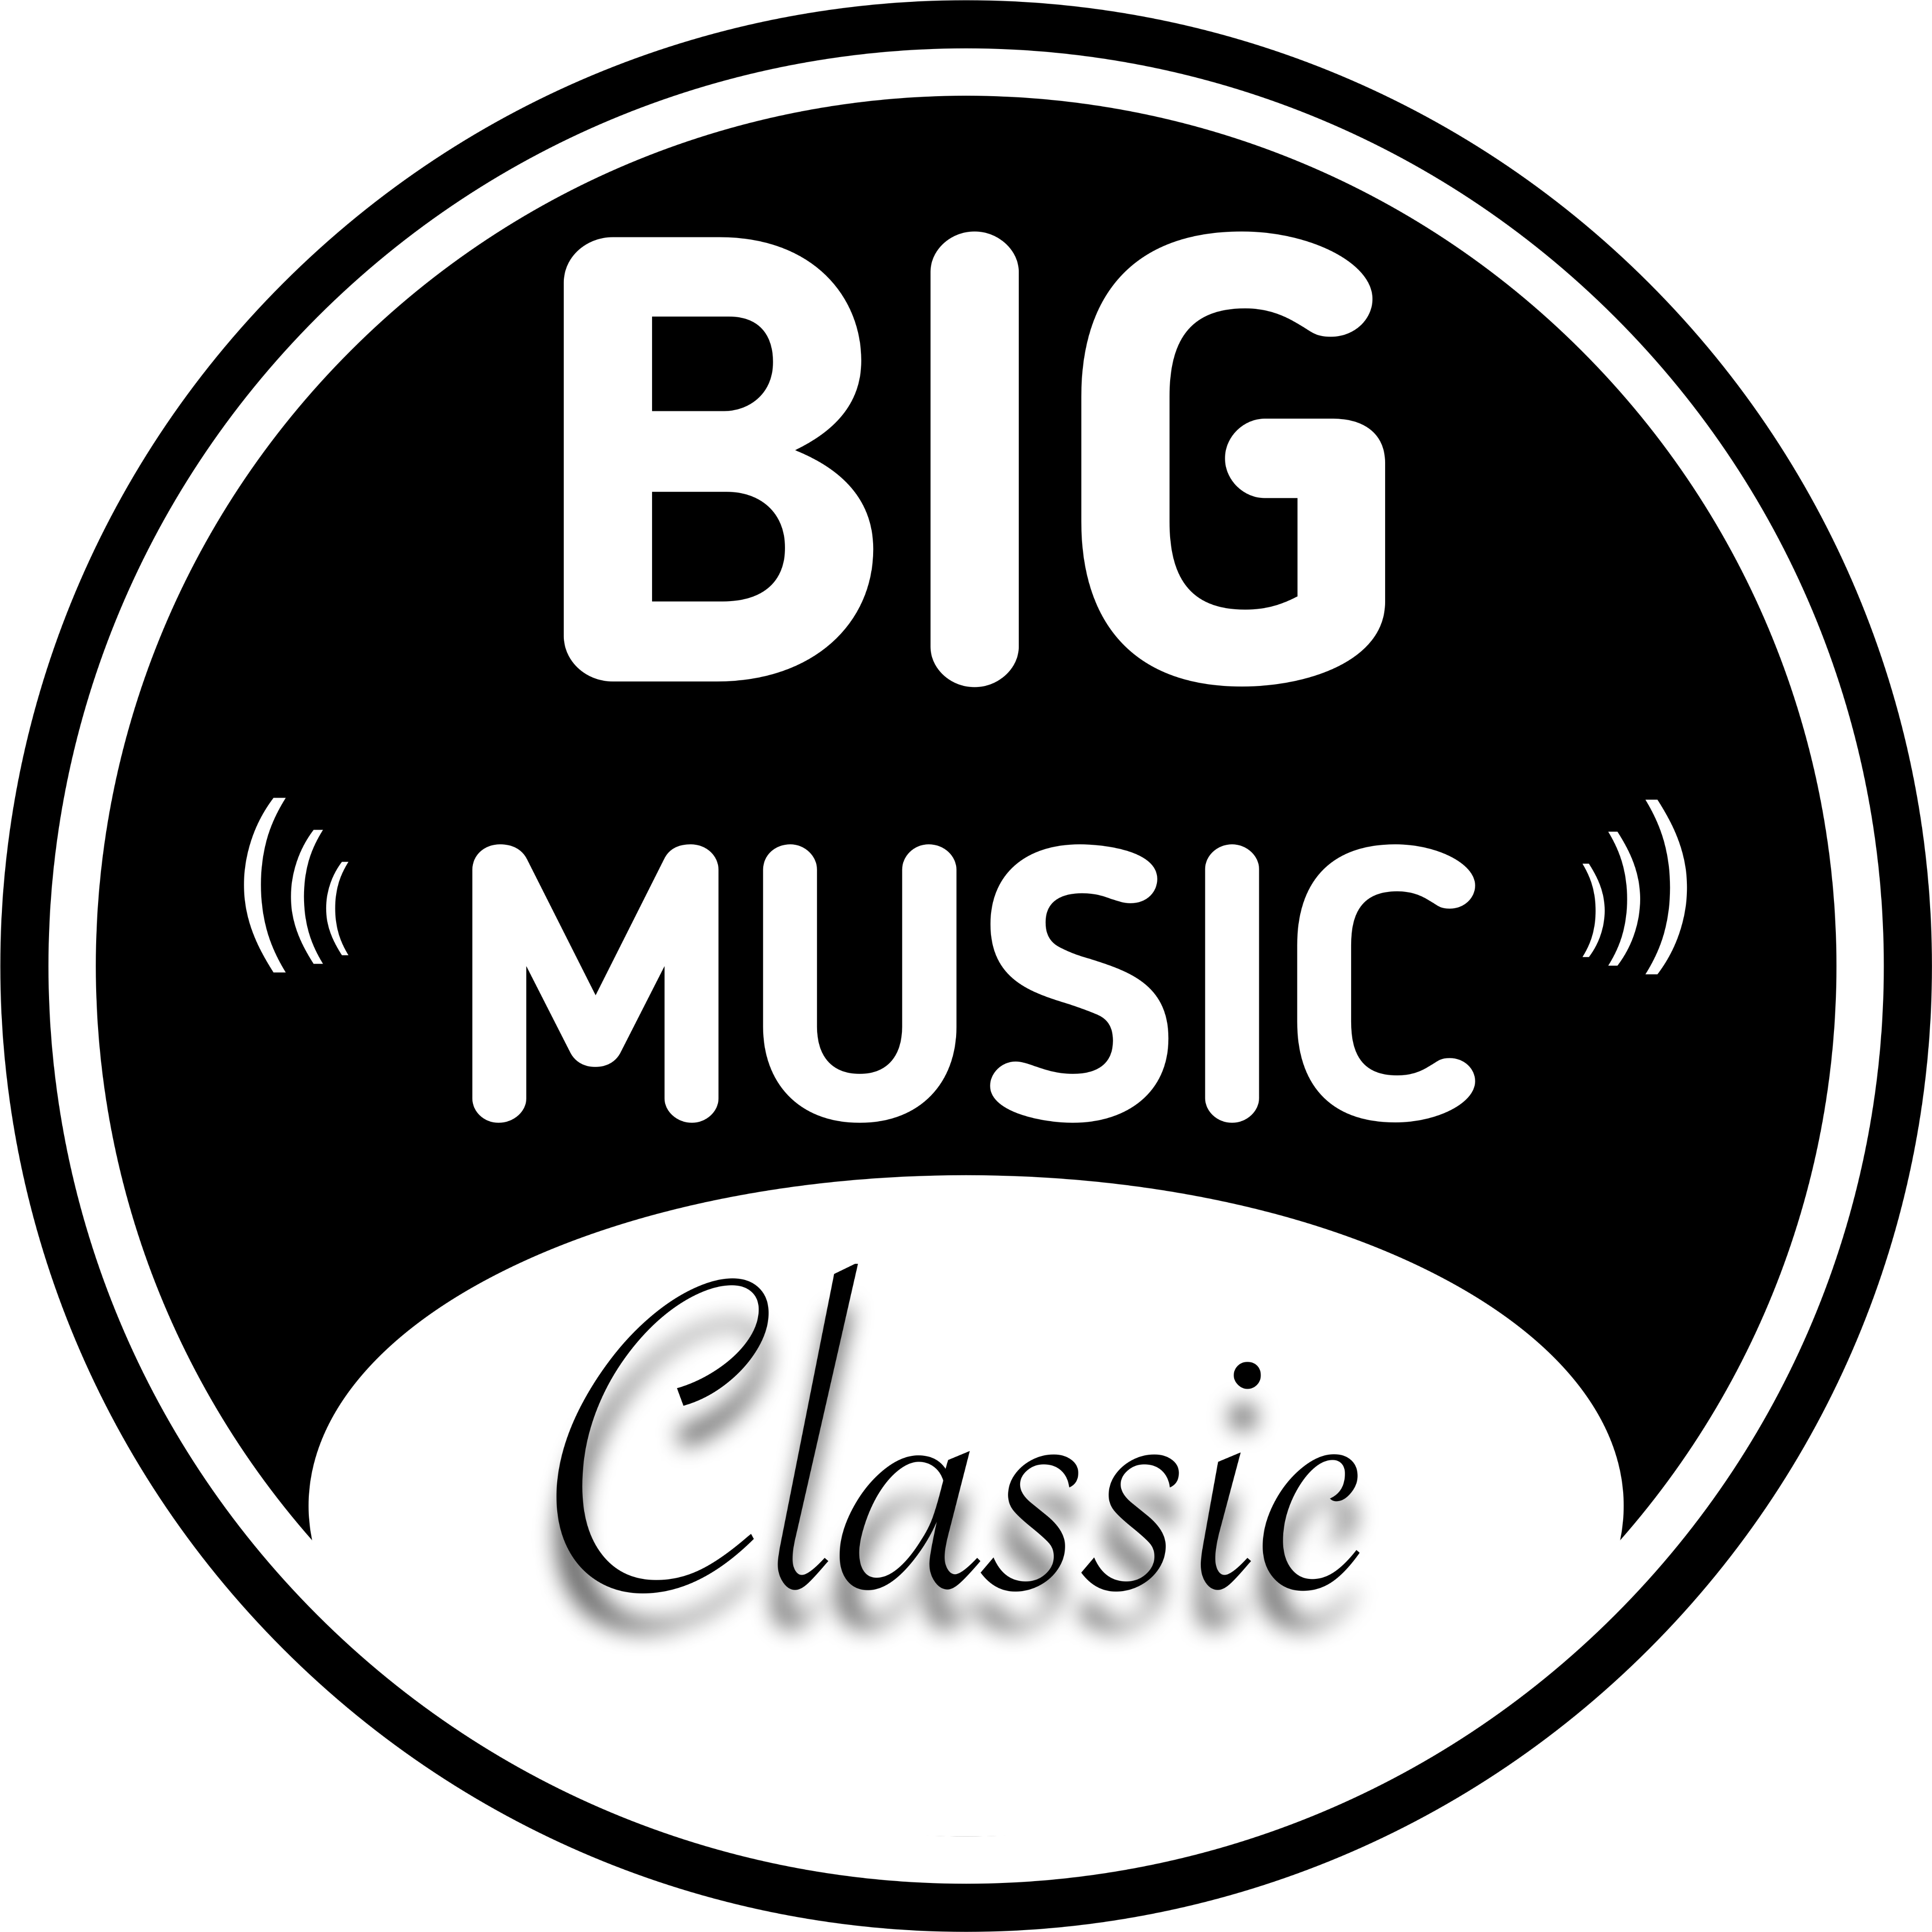 BIG Music Classic